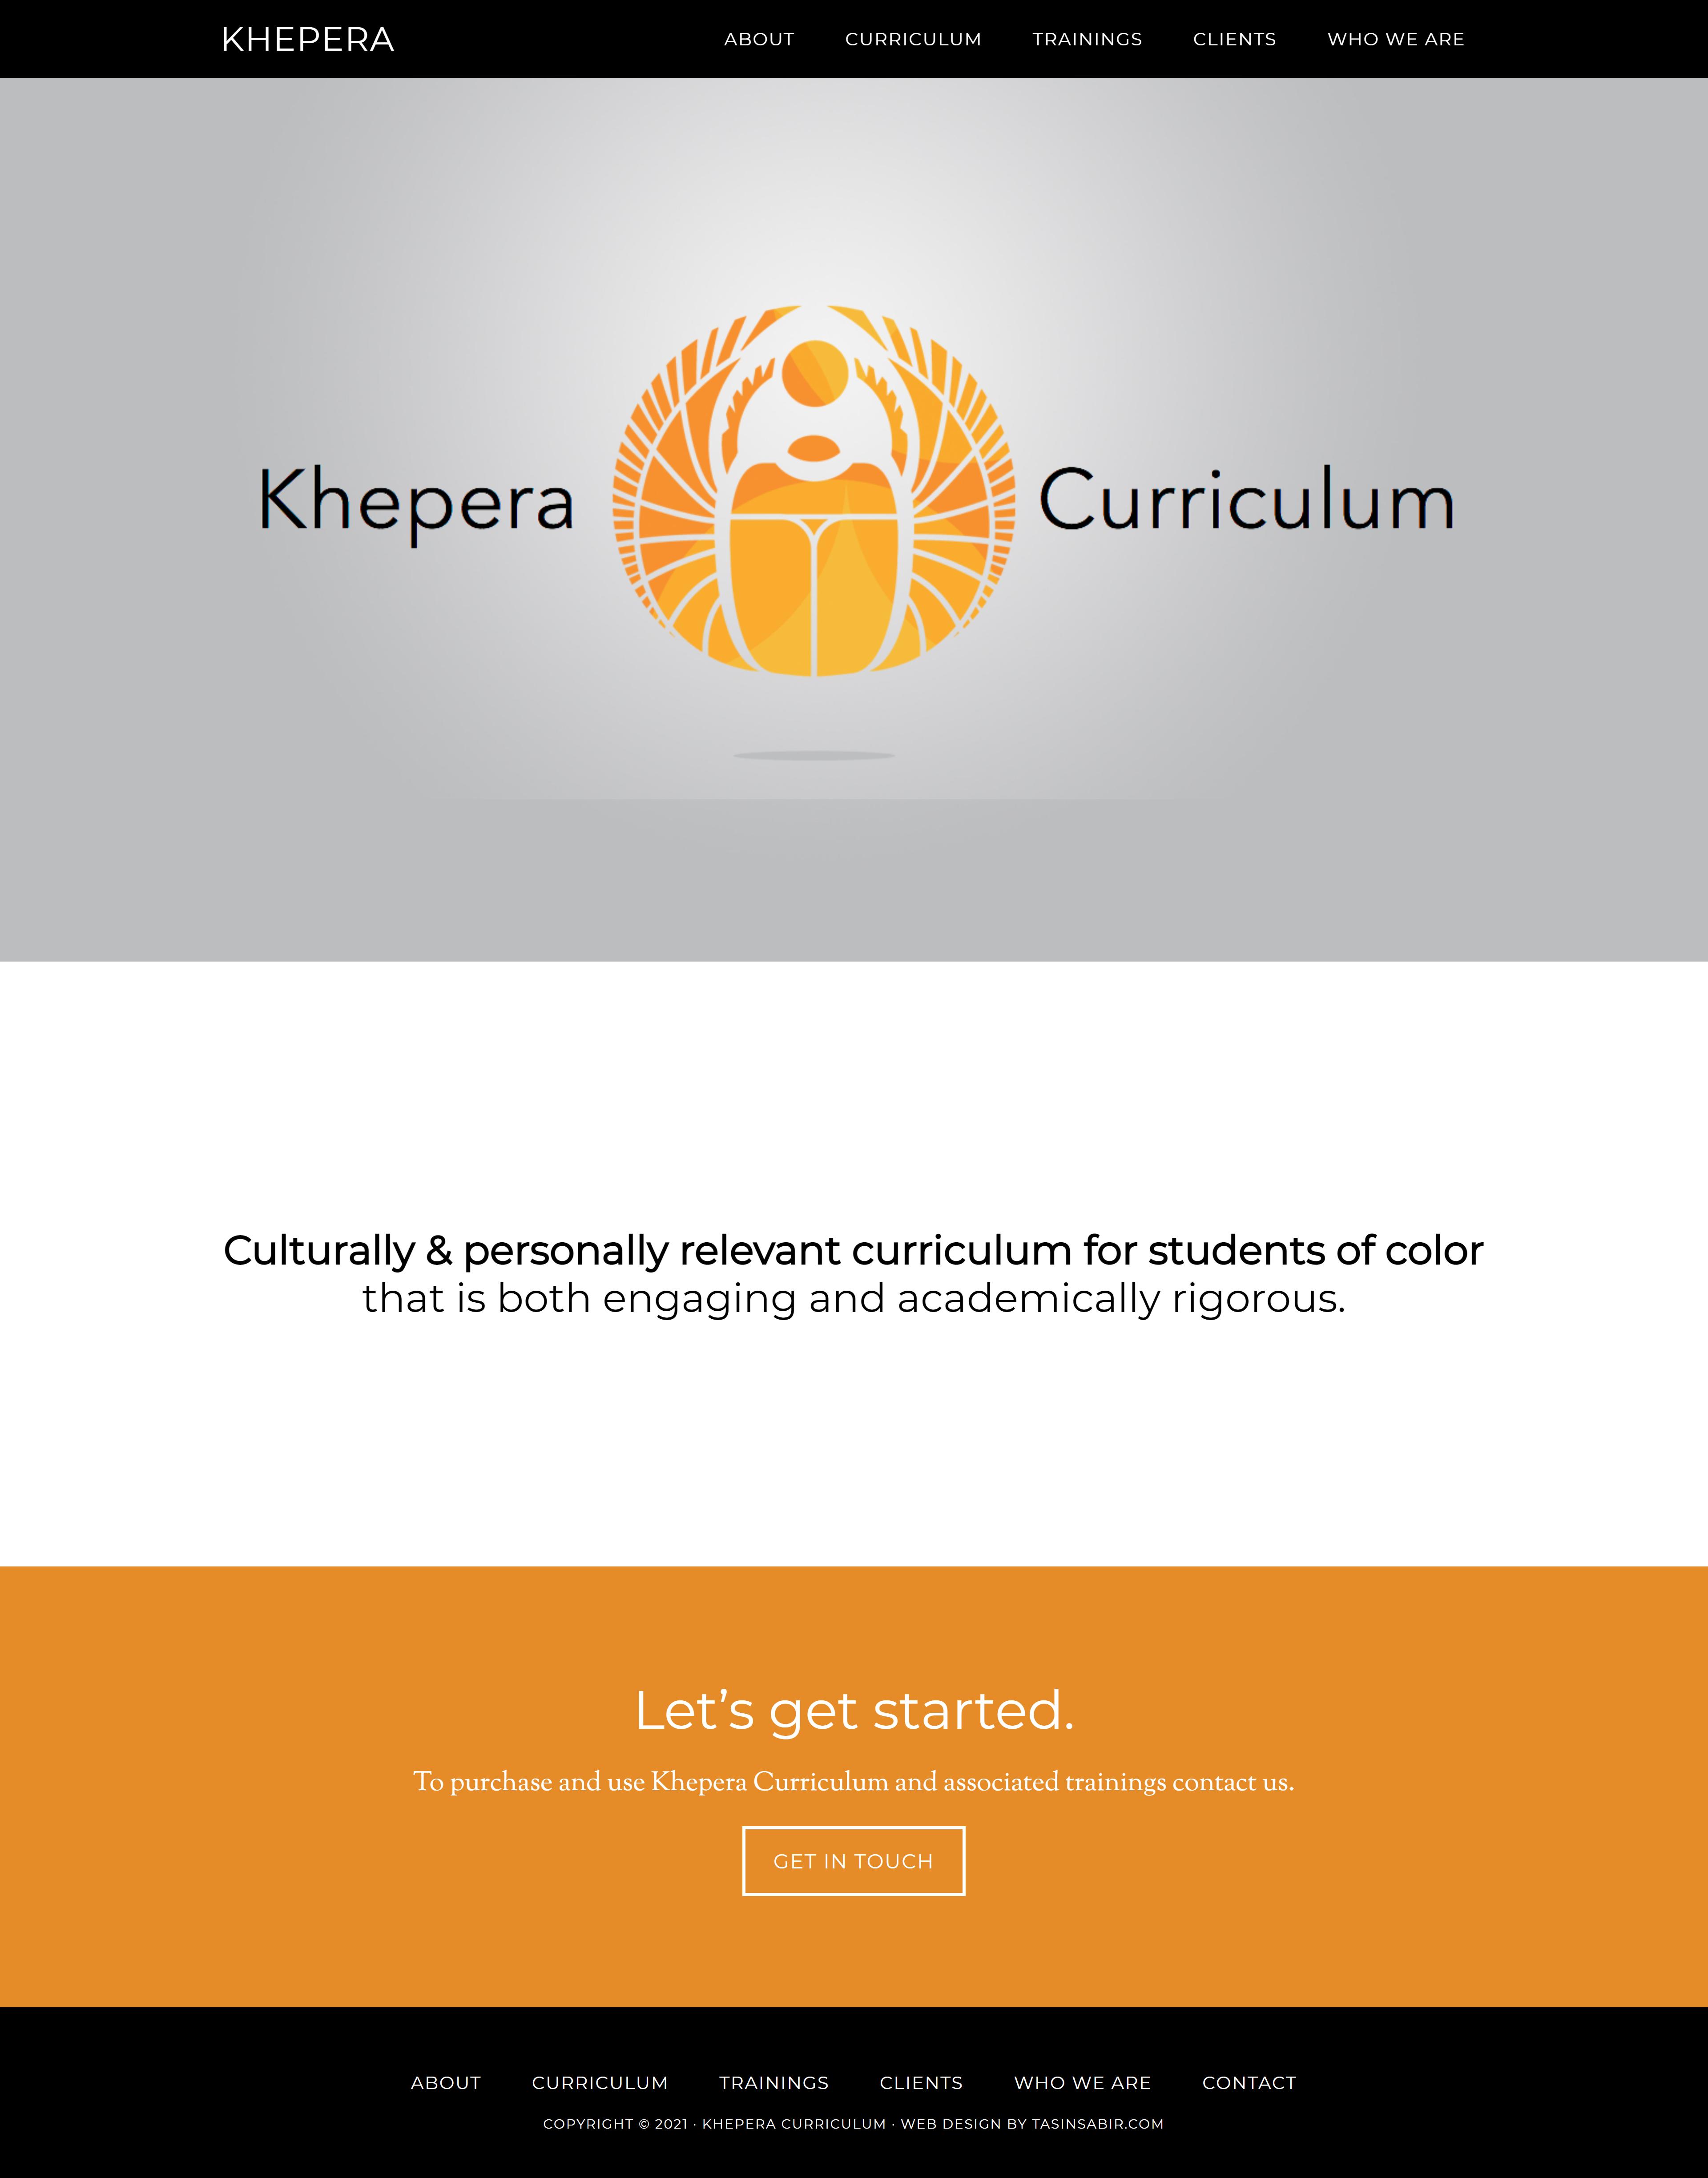 www.khepera.com